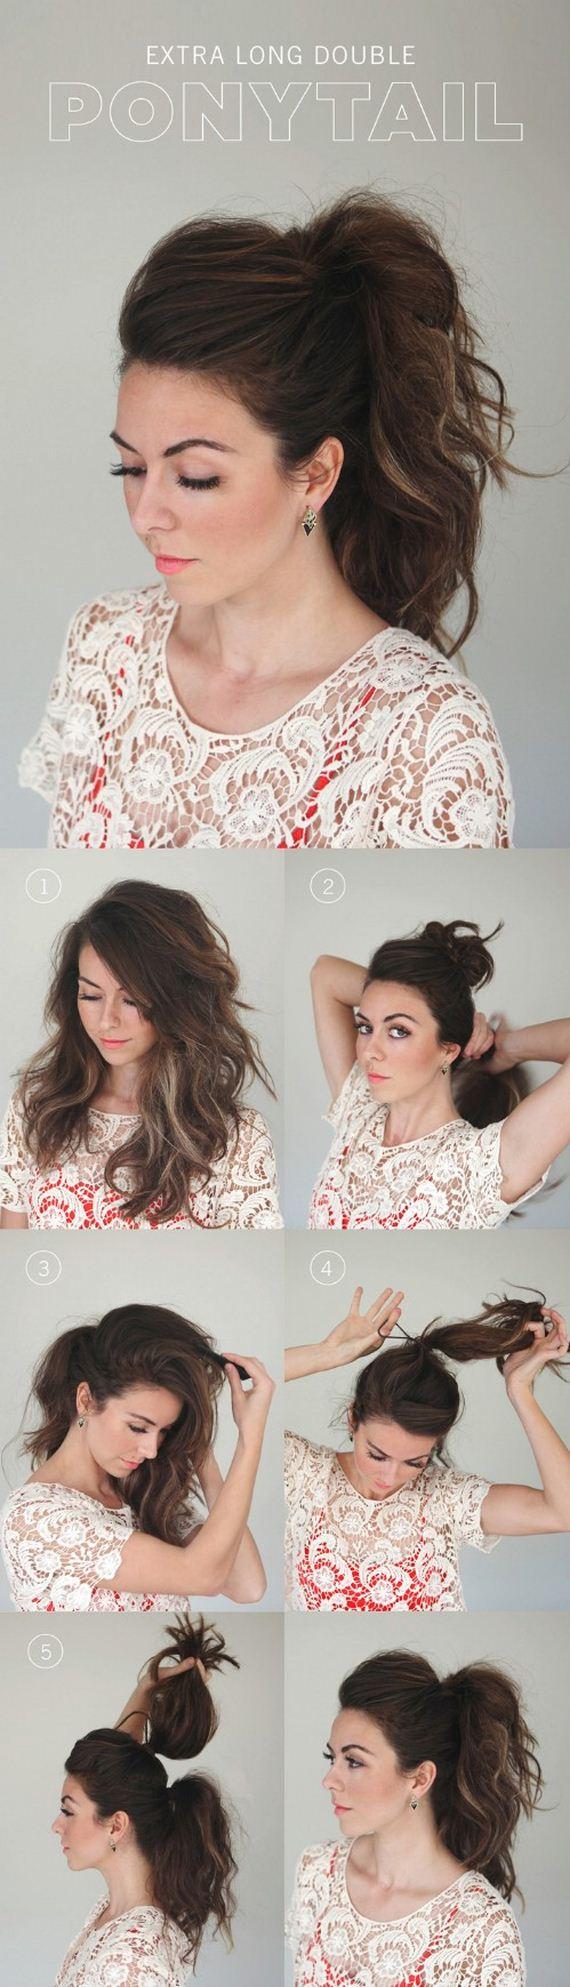 01-double-ponytail